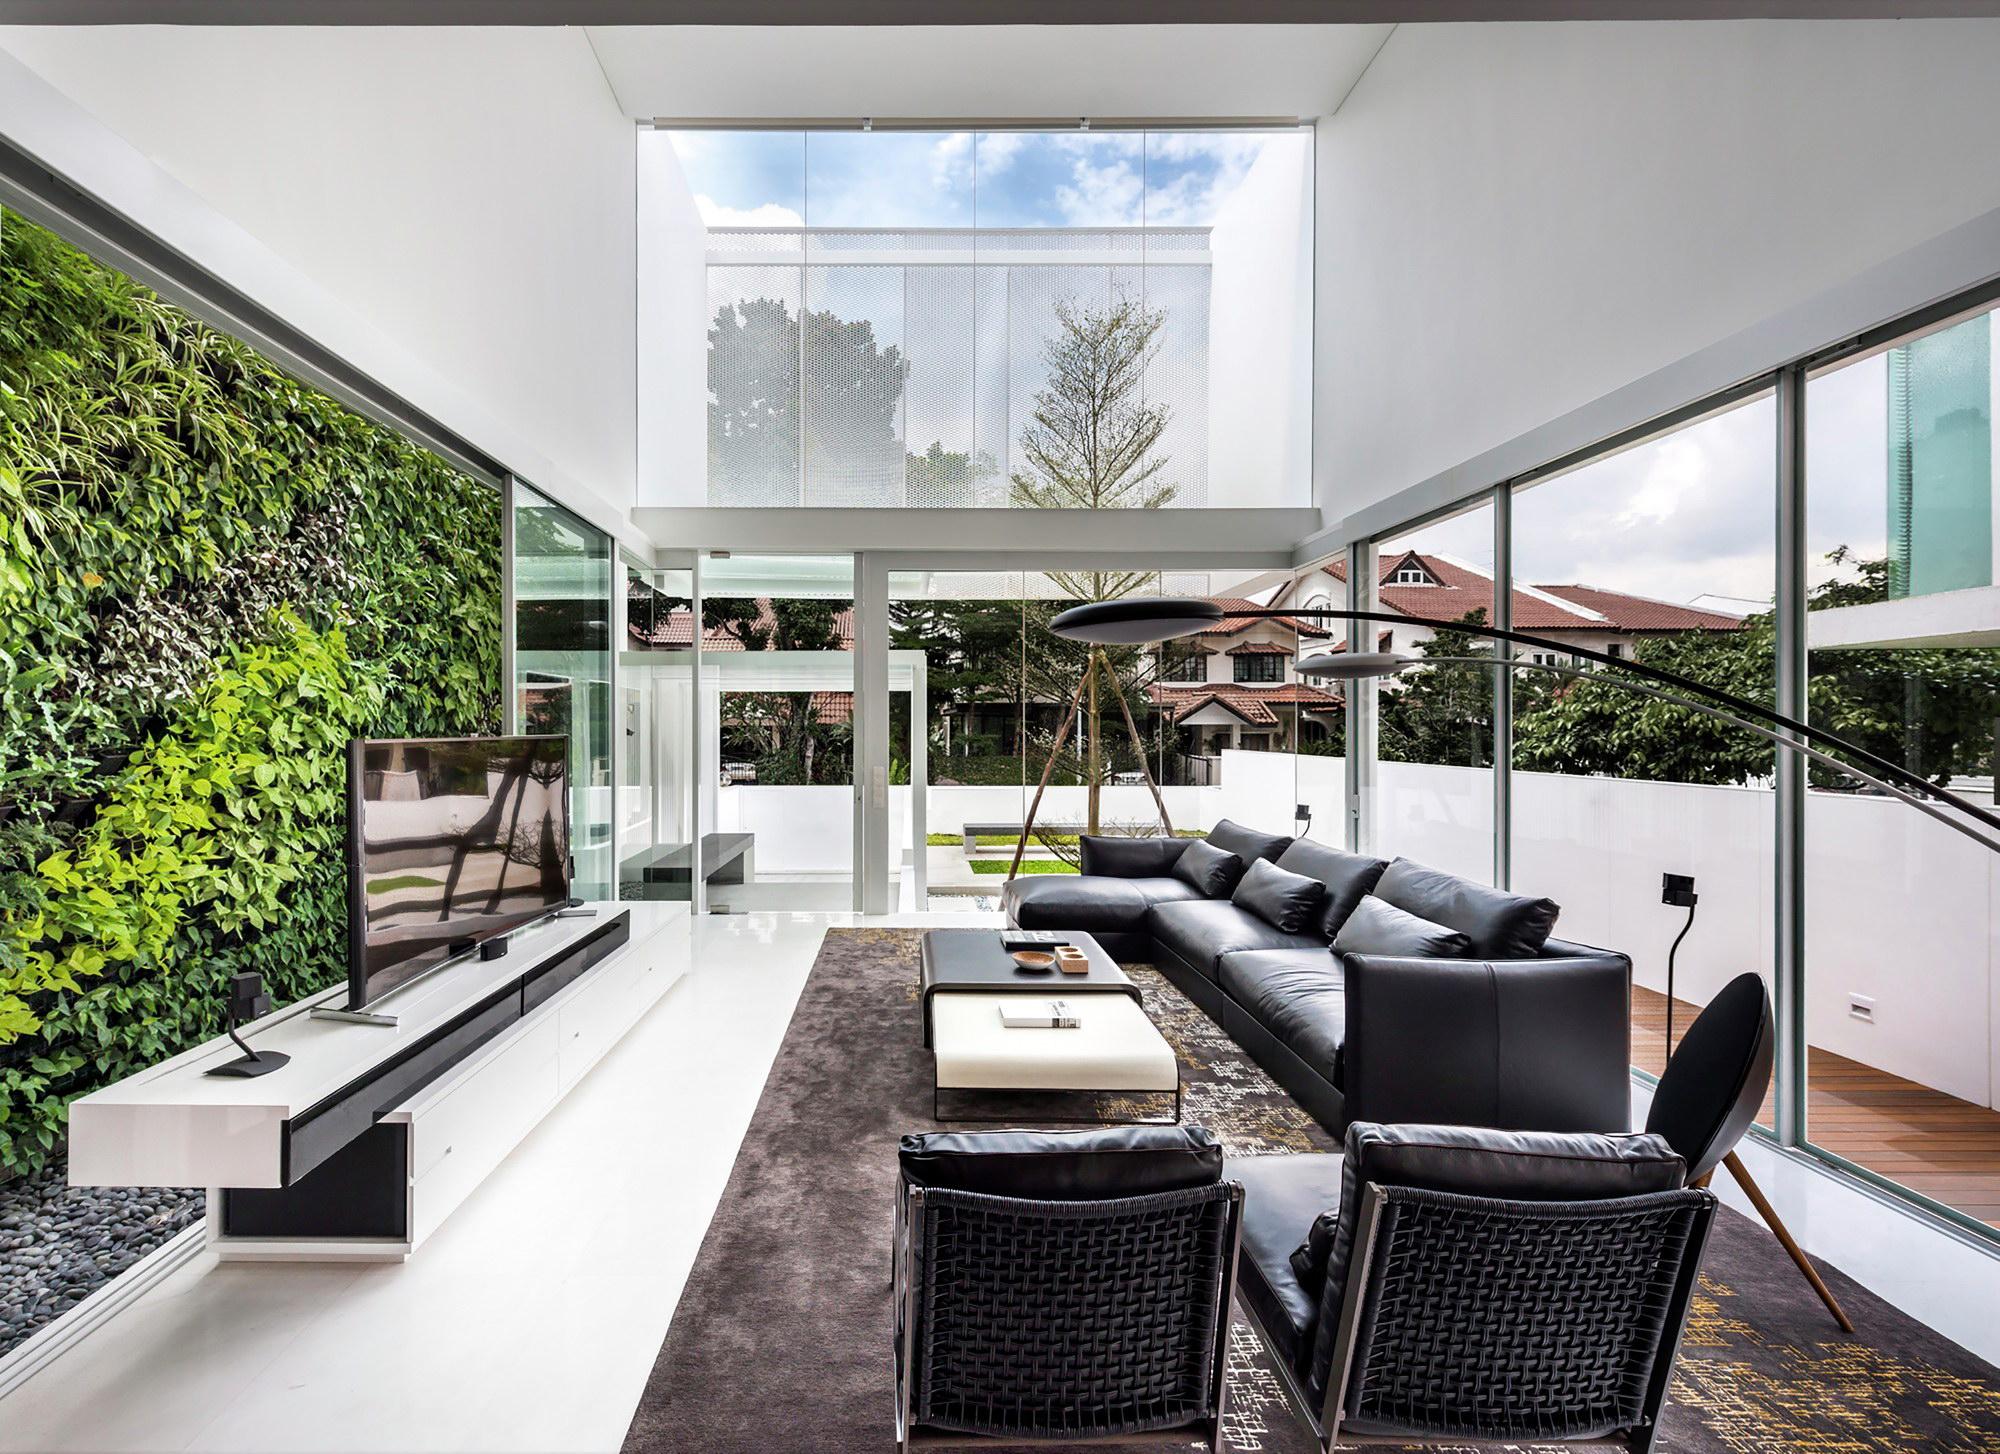 The Greja House by Park+Associates Architects